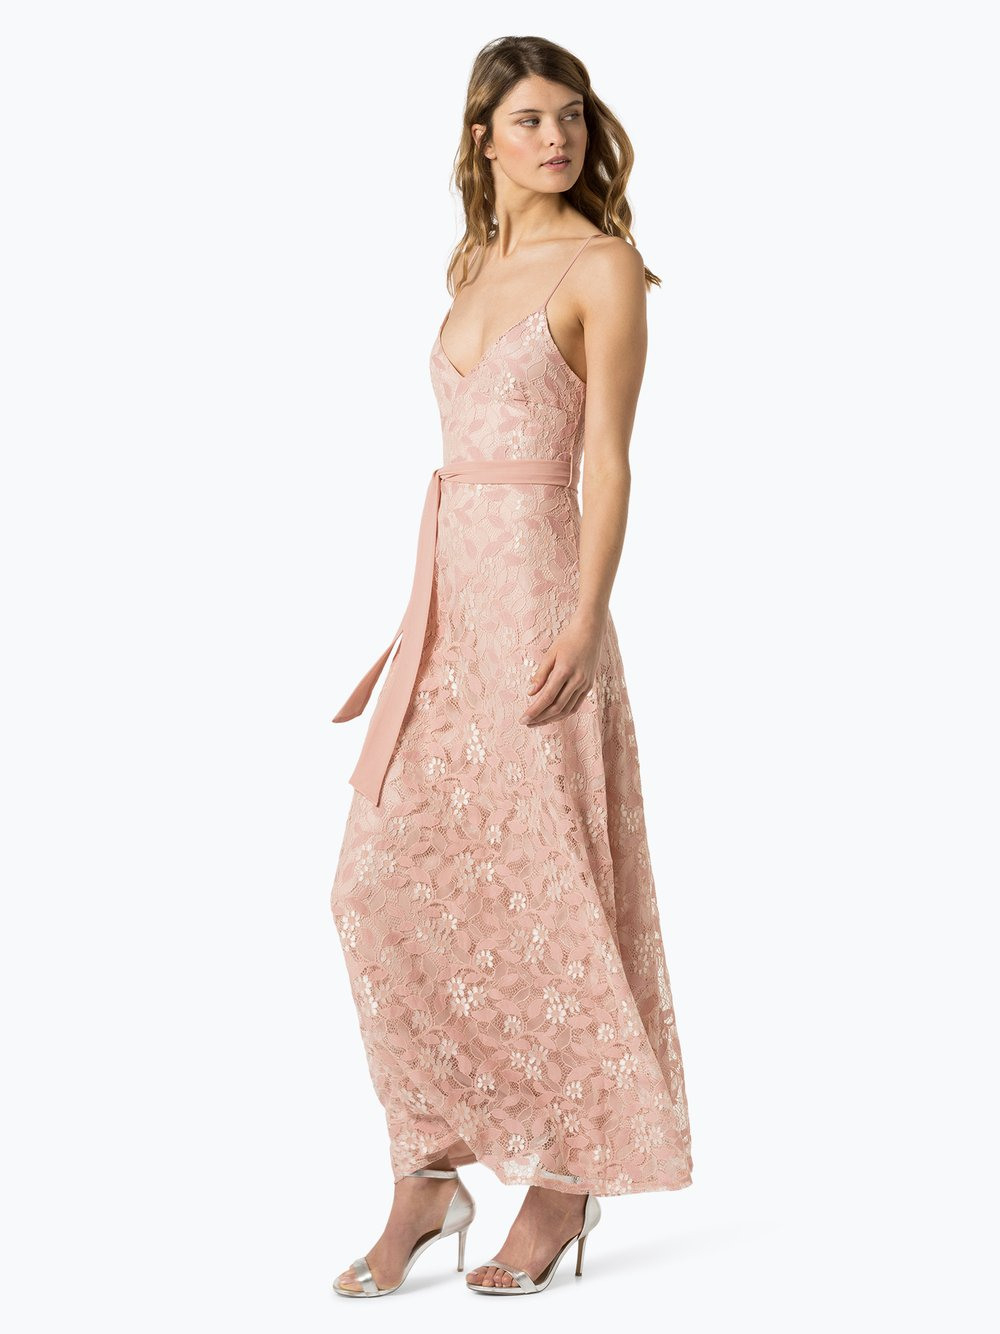 13 Perfekt Vila Abendkleid Design Kreativ Vila Abendkleid Vertrieb